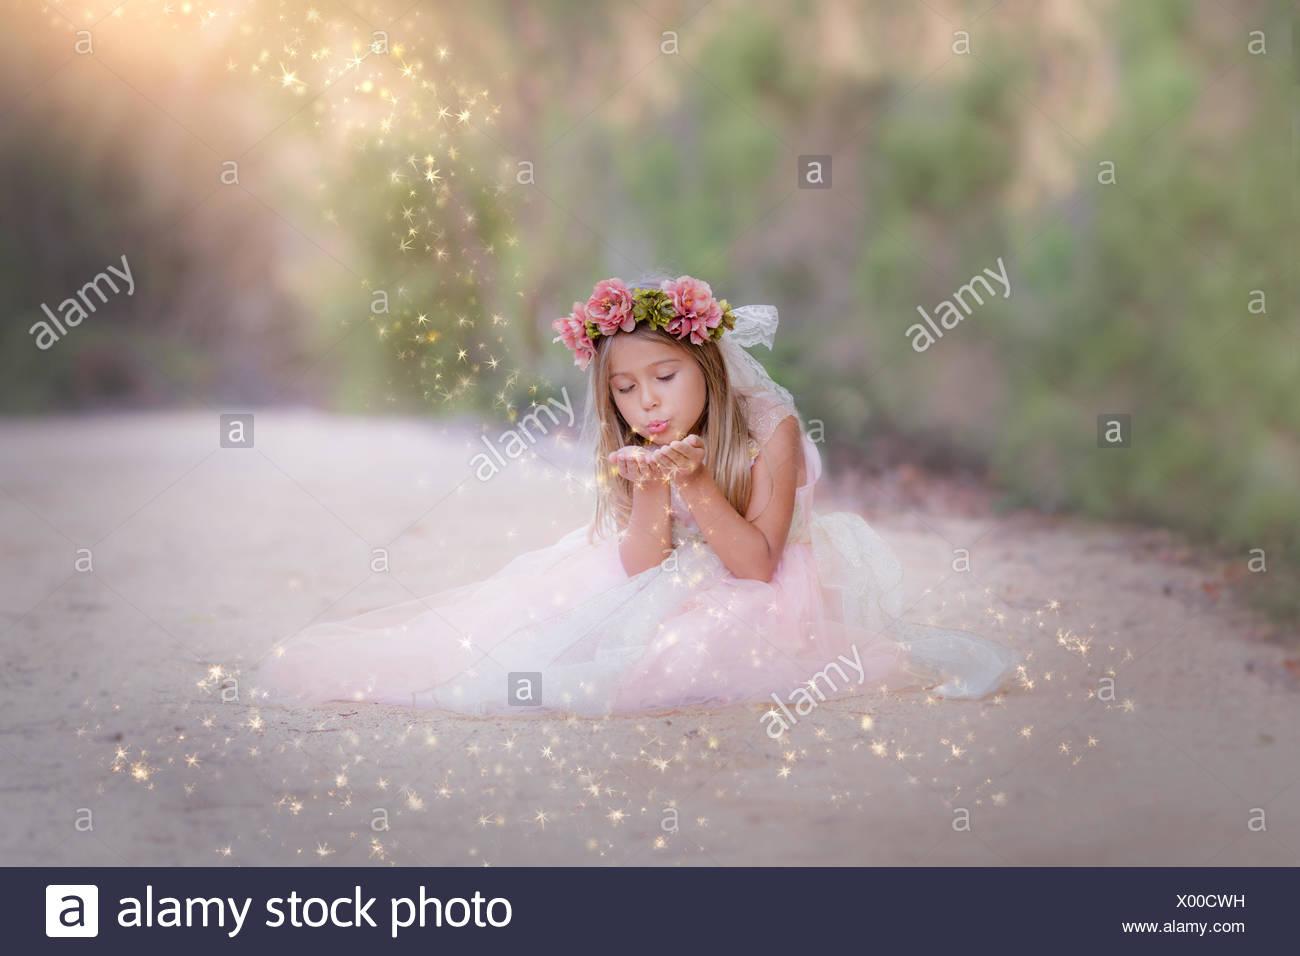 Chica sentada en la carretera, soplando glitter Imagen De Stock